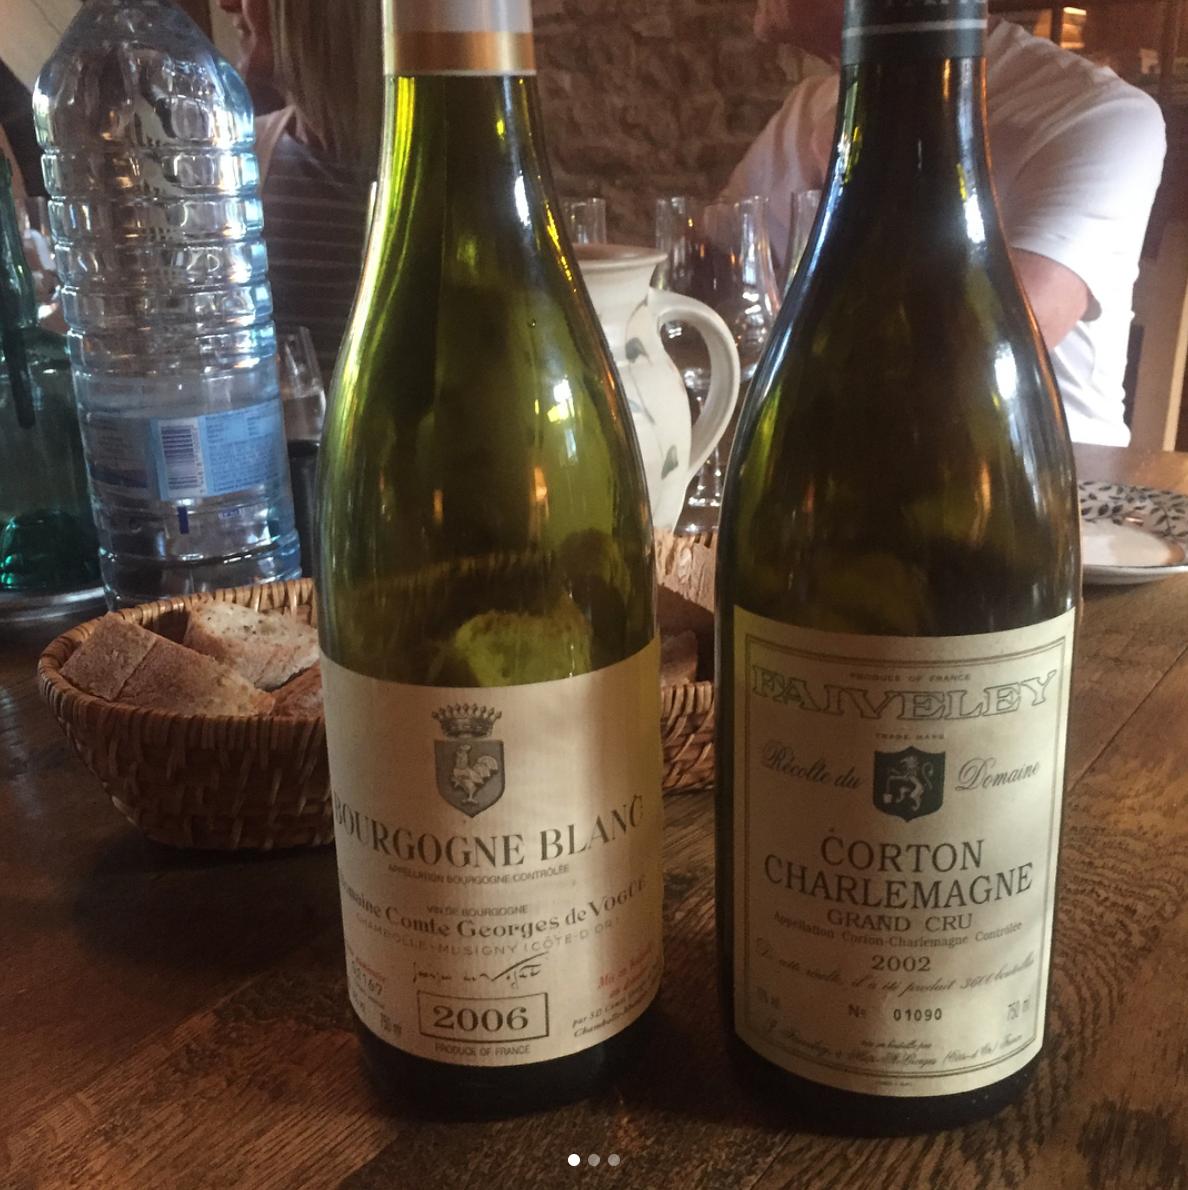 Bourgogne Blanc & Corton Charlemagne